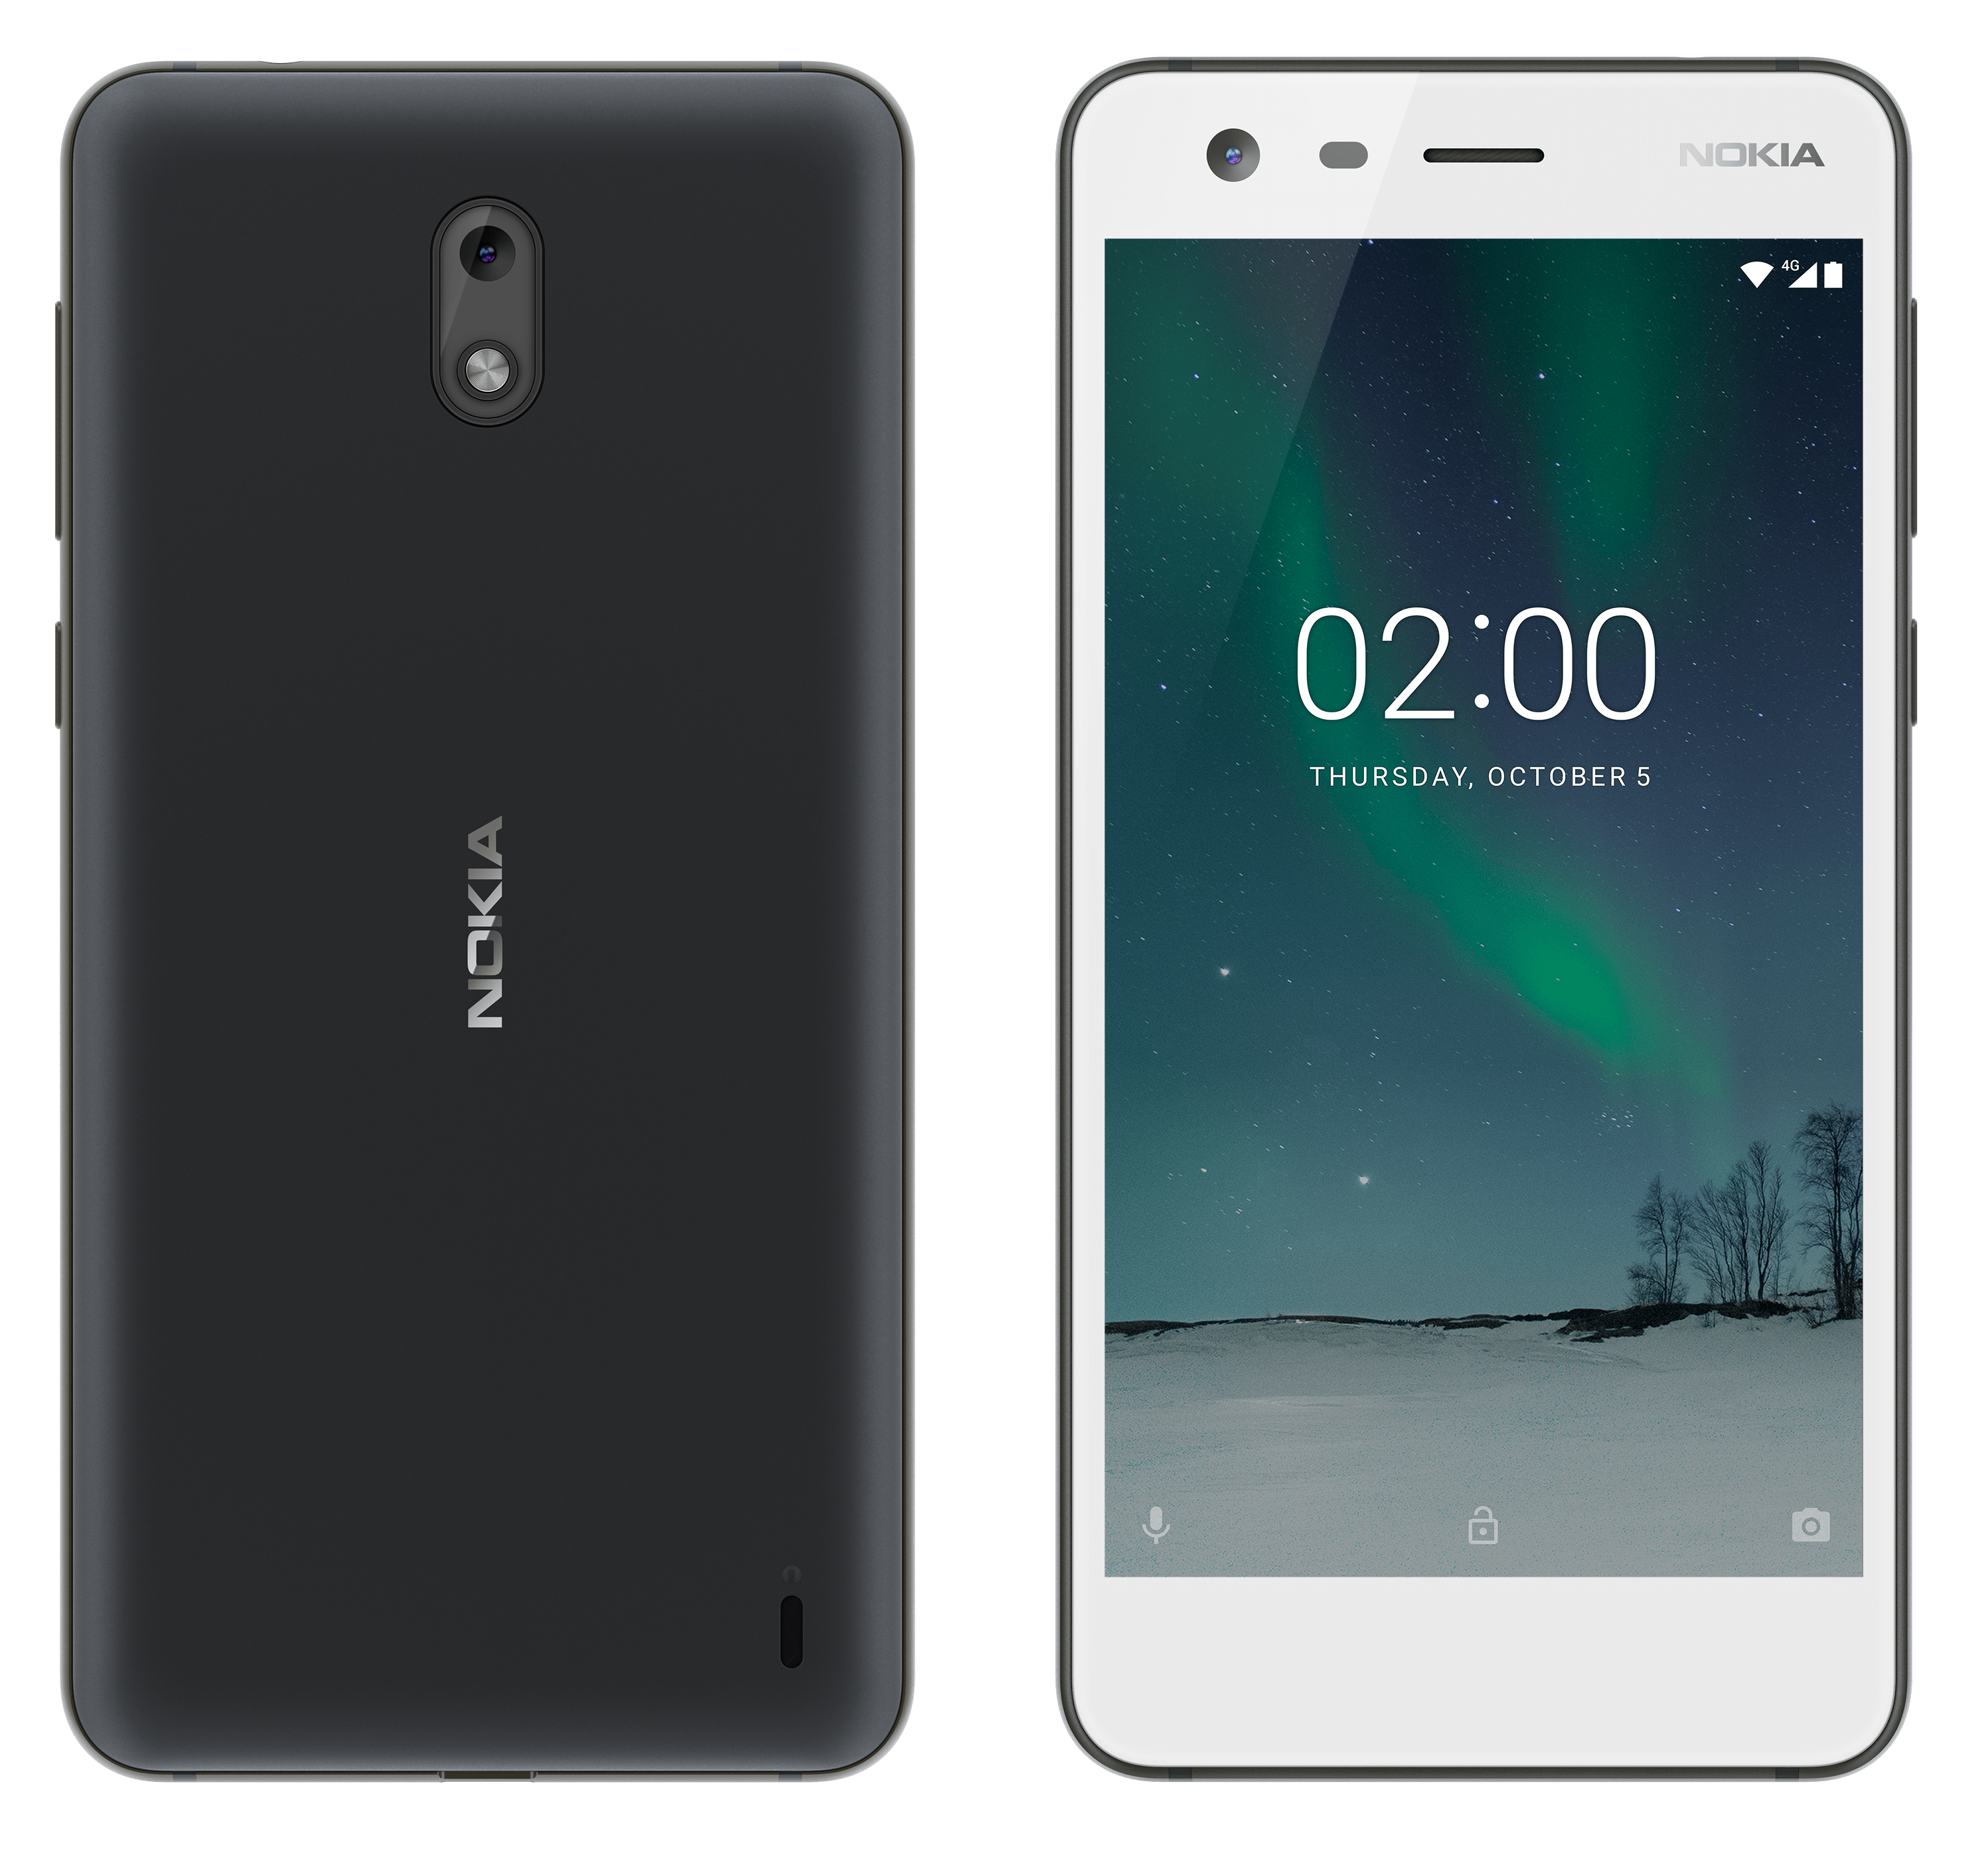 Nokia E5 – Furnishing Boundless Advantages for Everyone